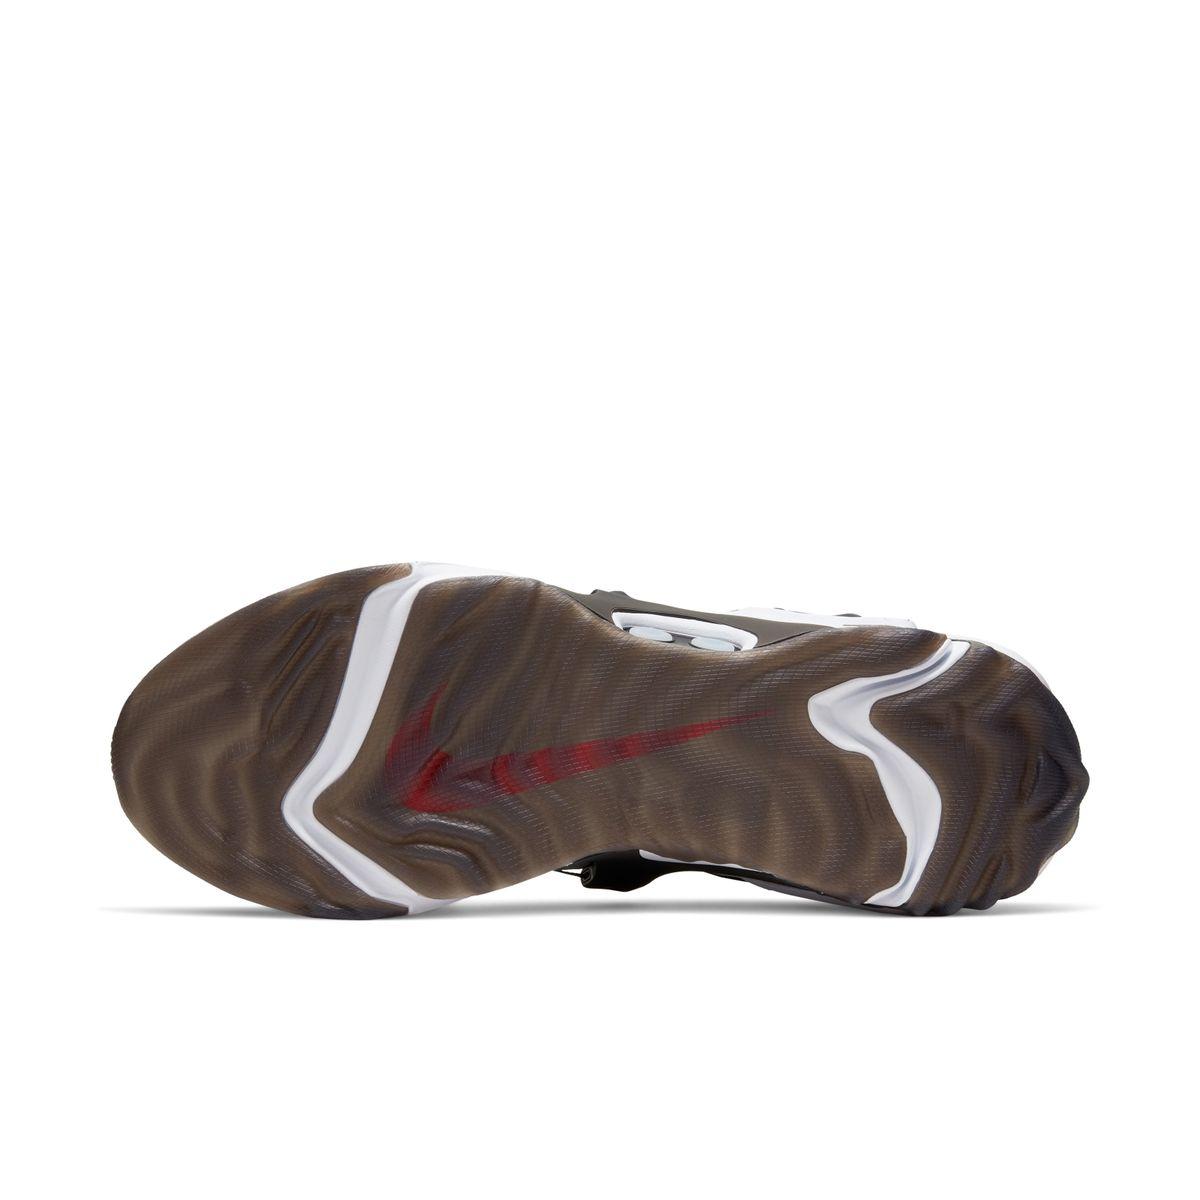 Nike — Adapt Huarache White - Image 6